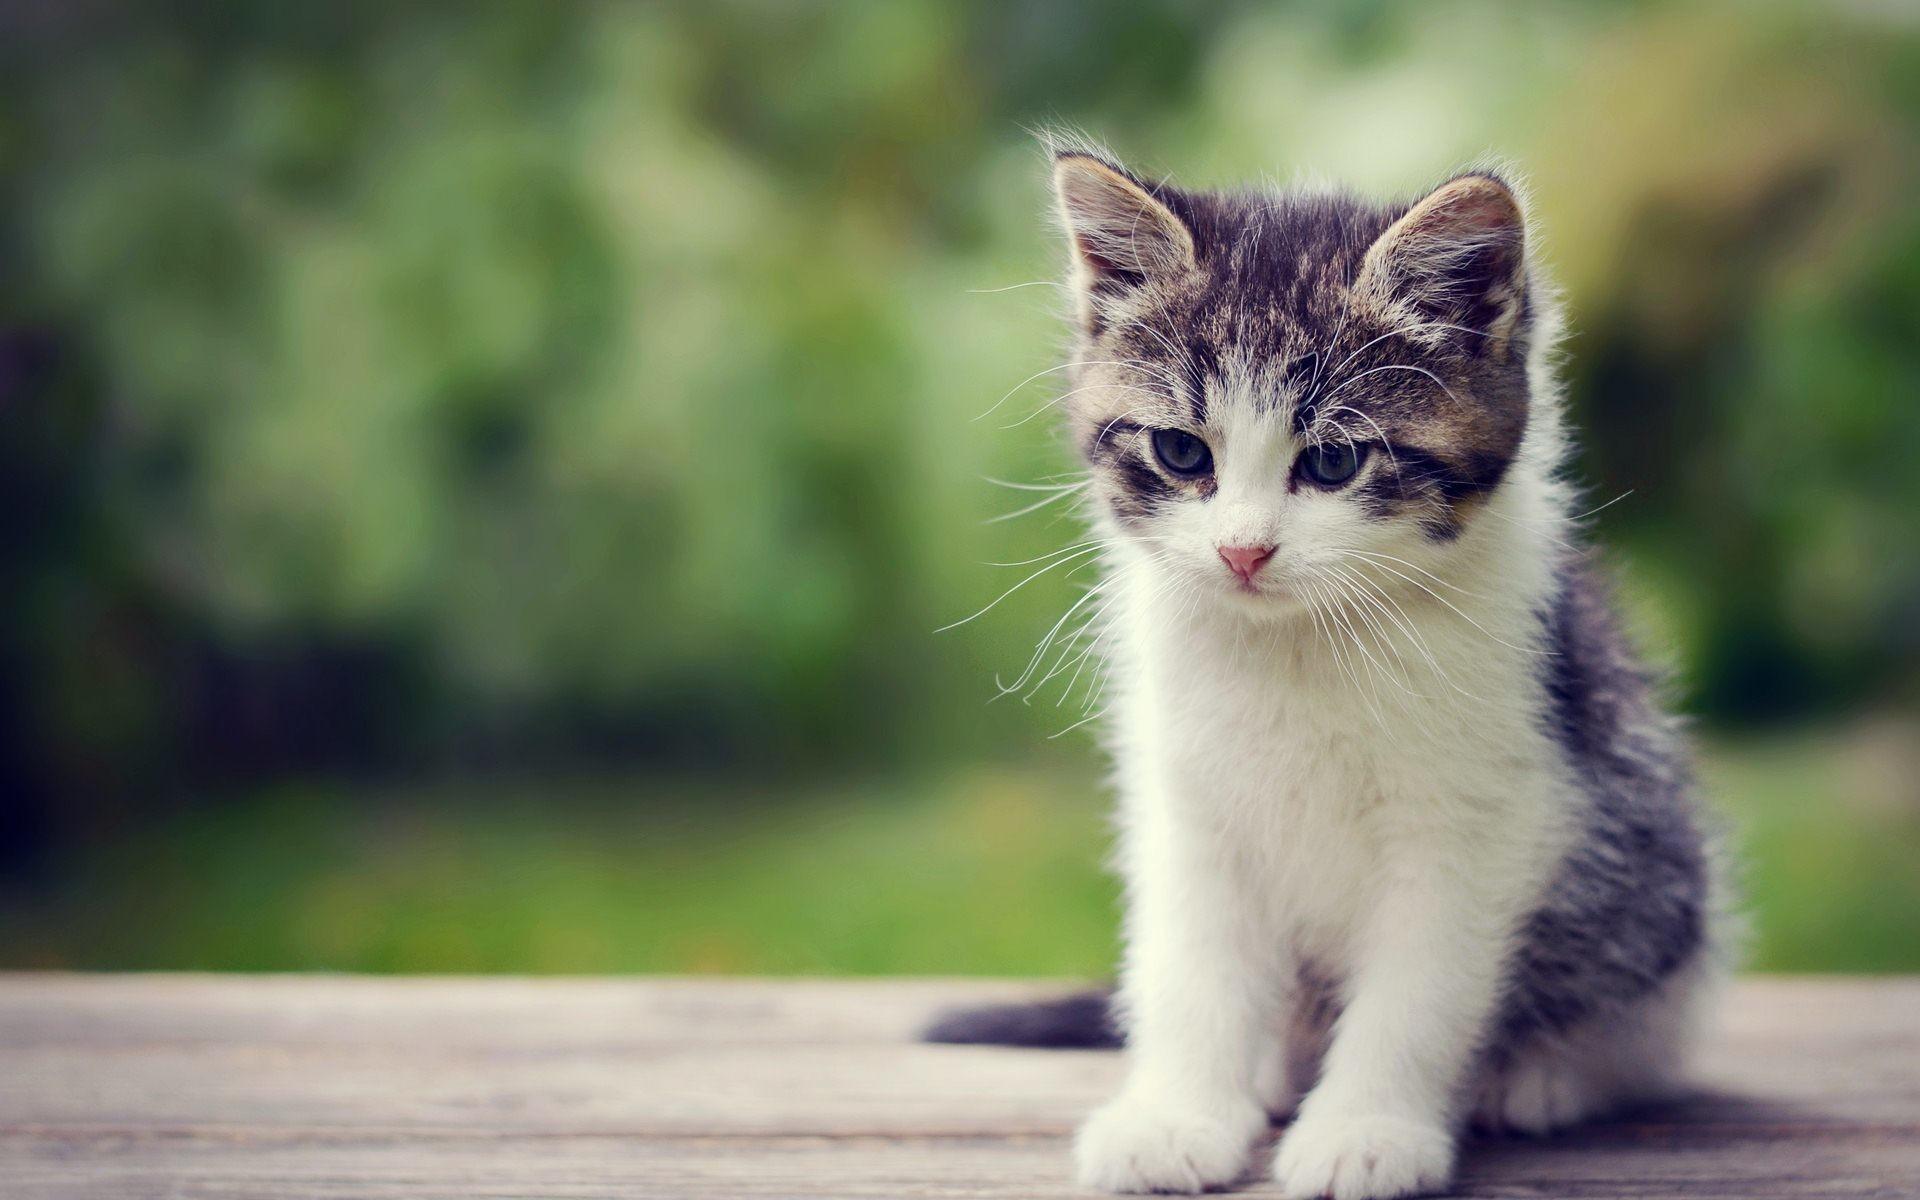 Cute kitten wallpapers wallpapertag - Cute kitten backgrounds for desktop ...